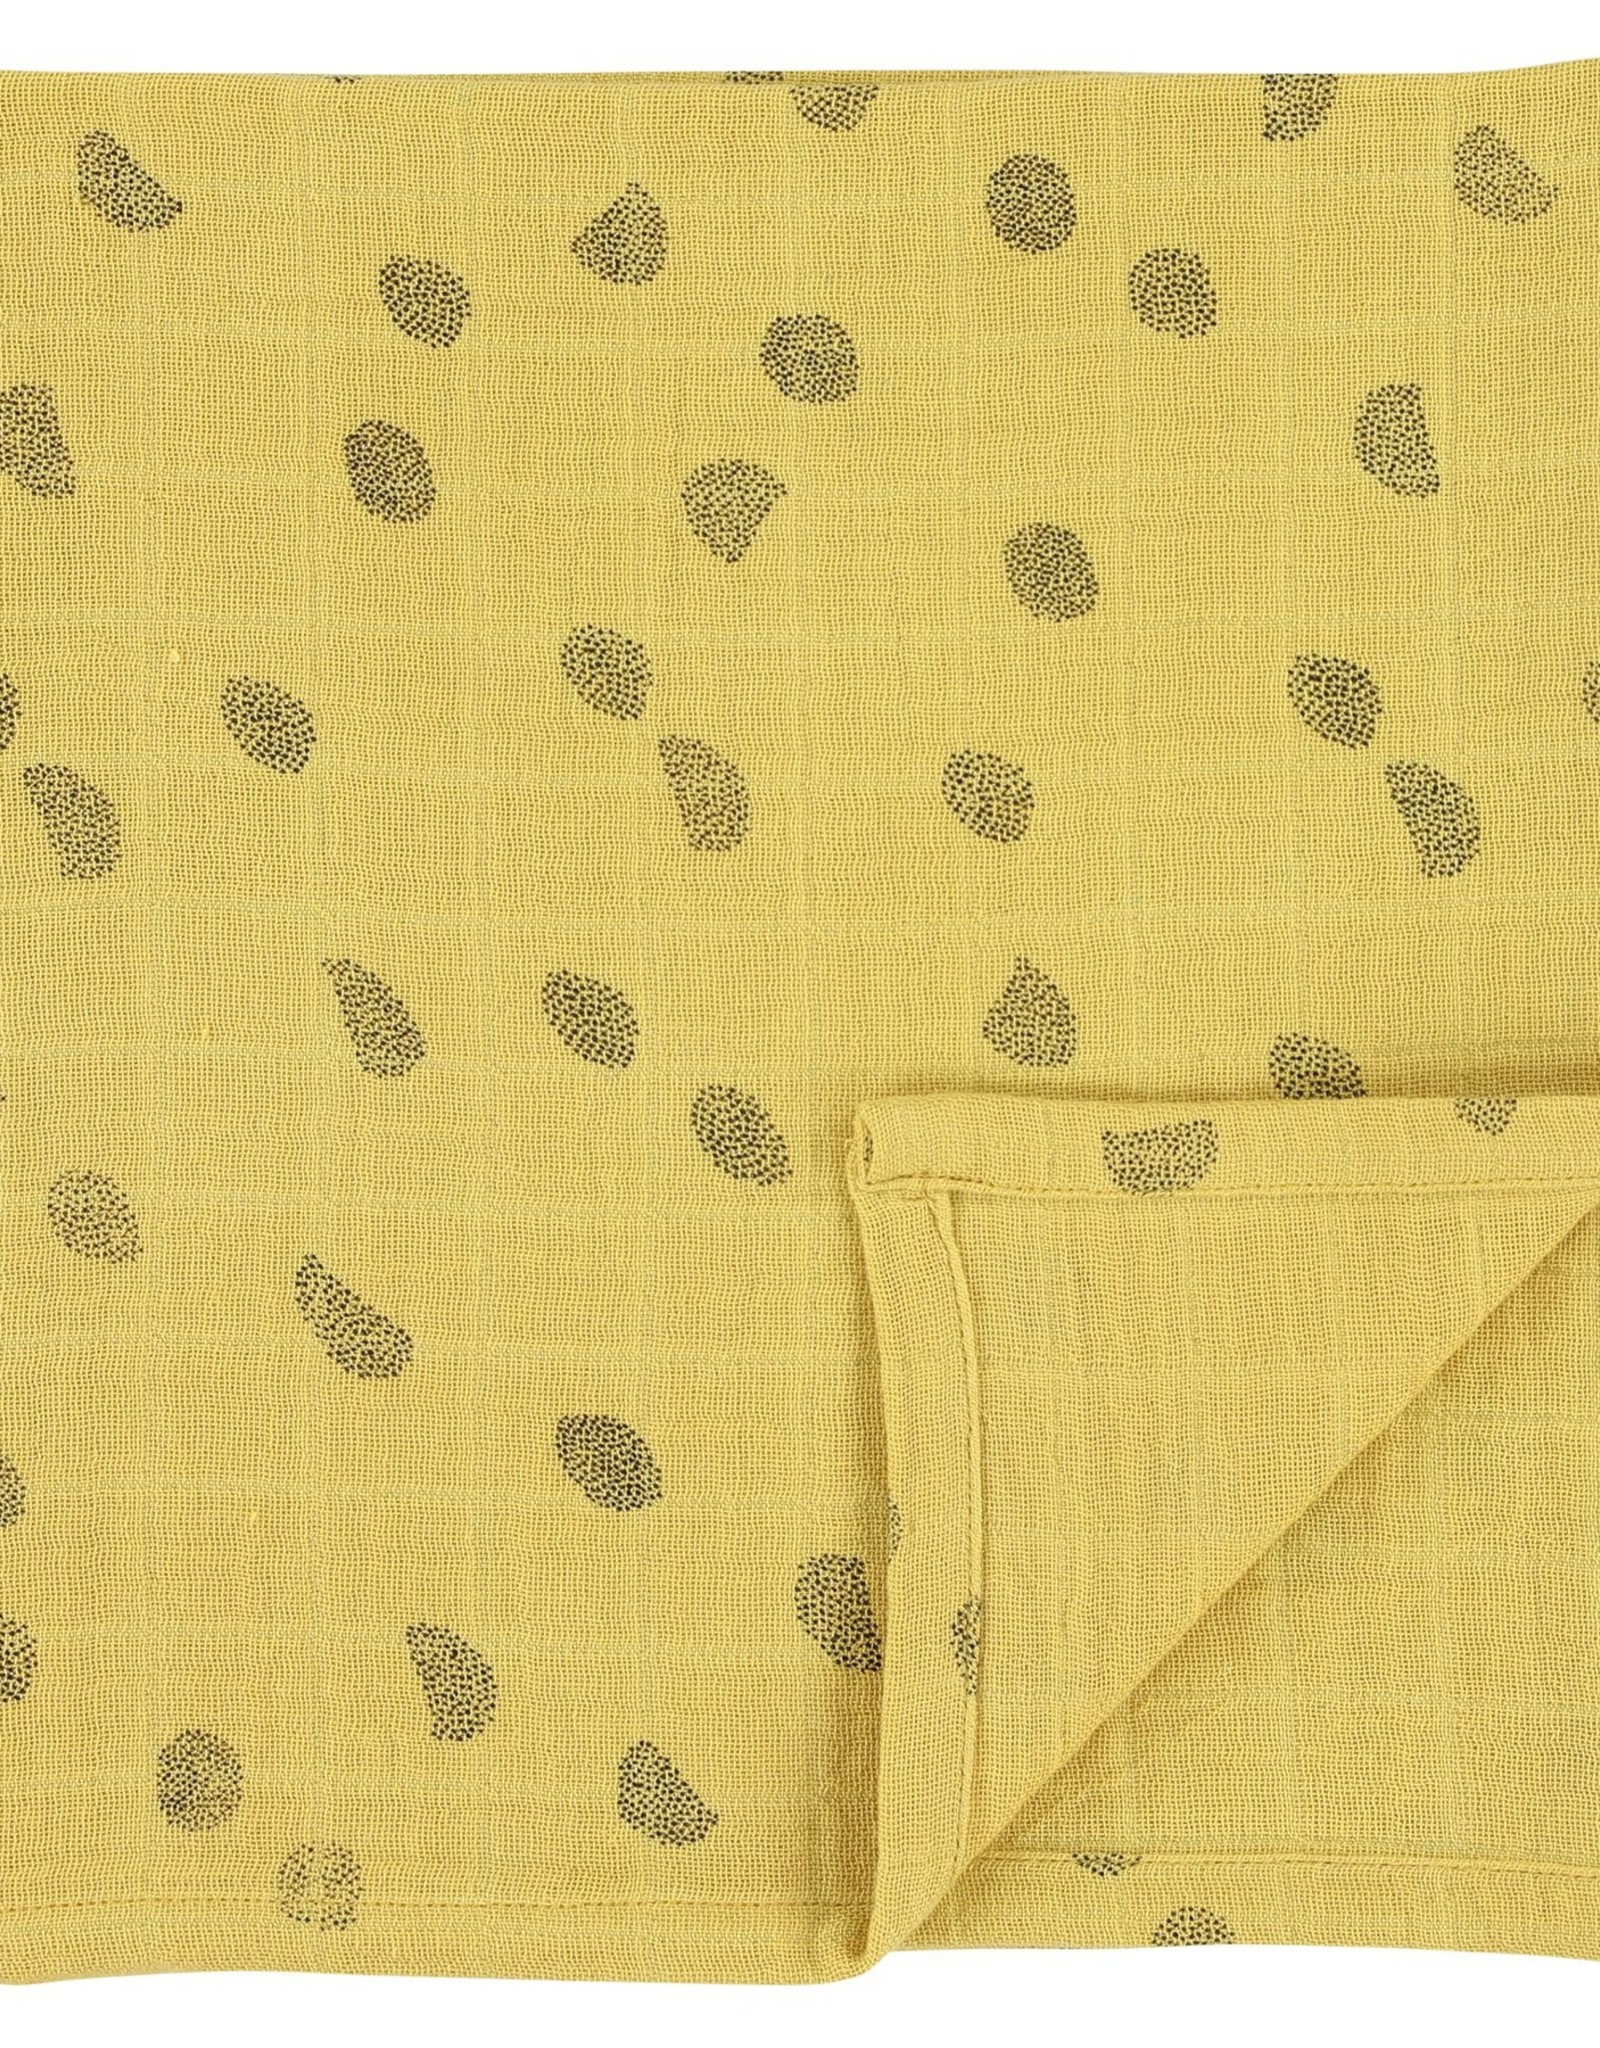 Trixie Trixie set van 2 muslin doeken sunny spots